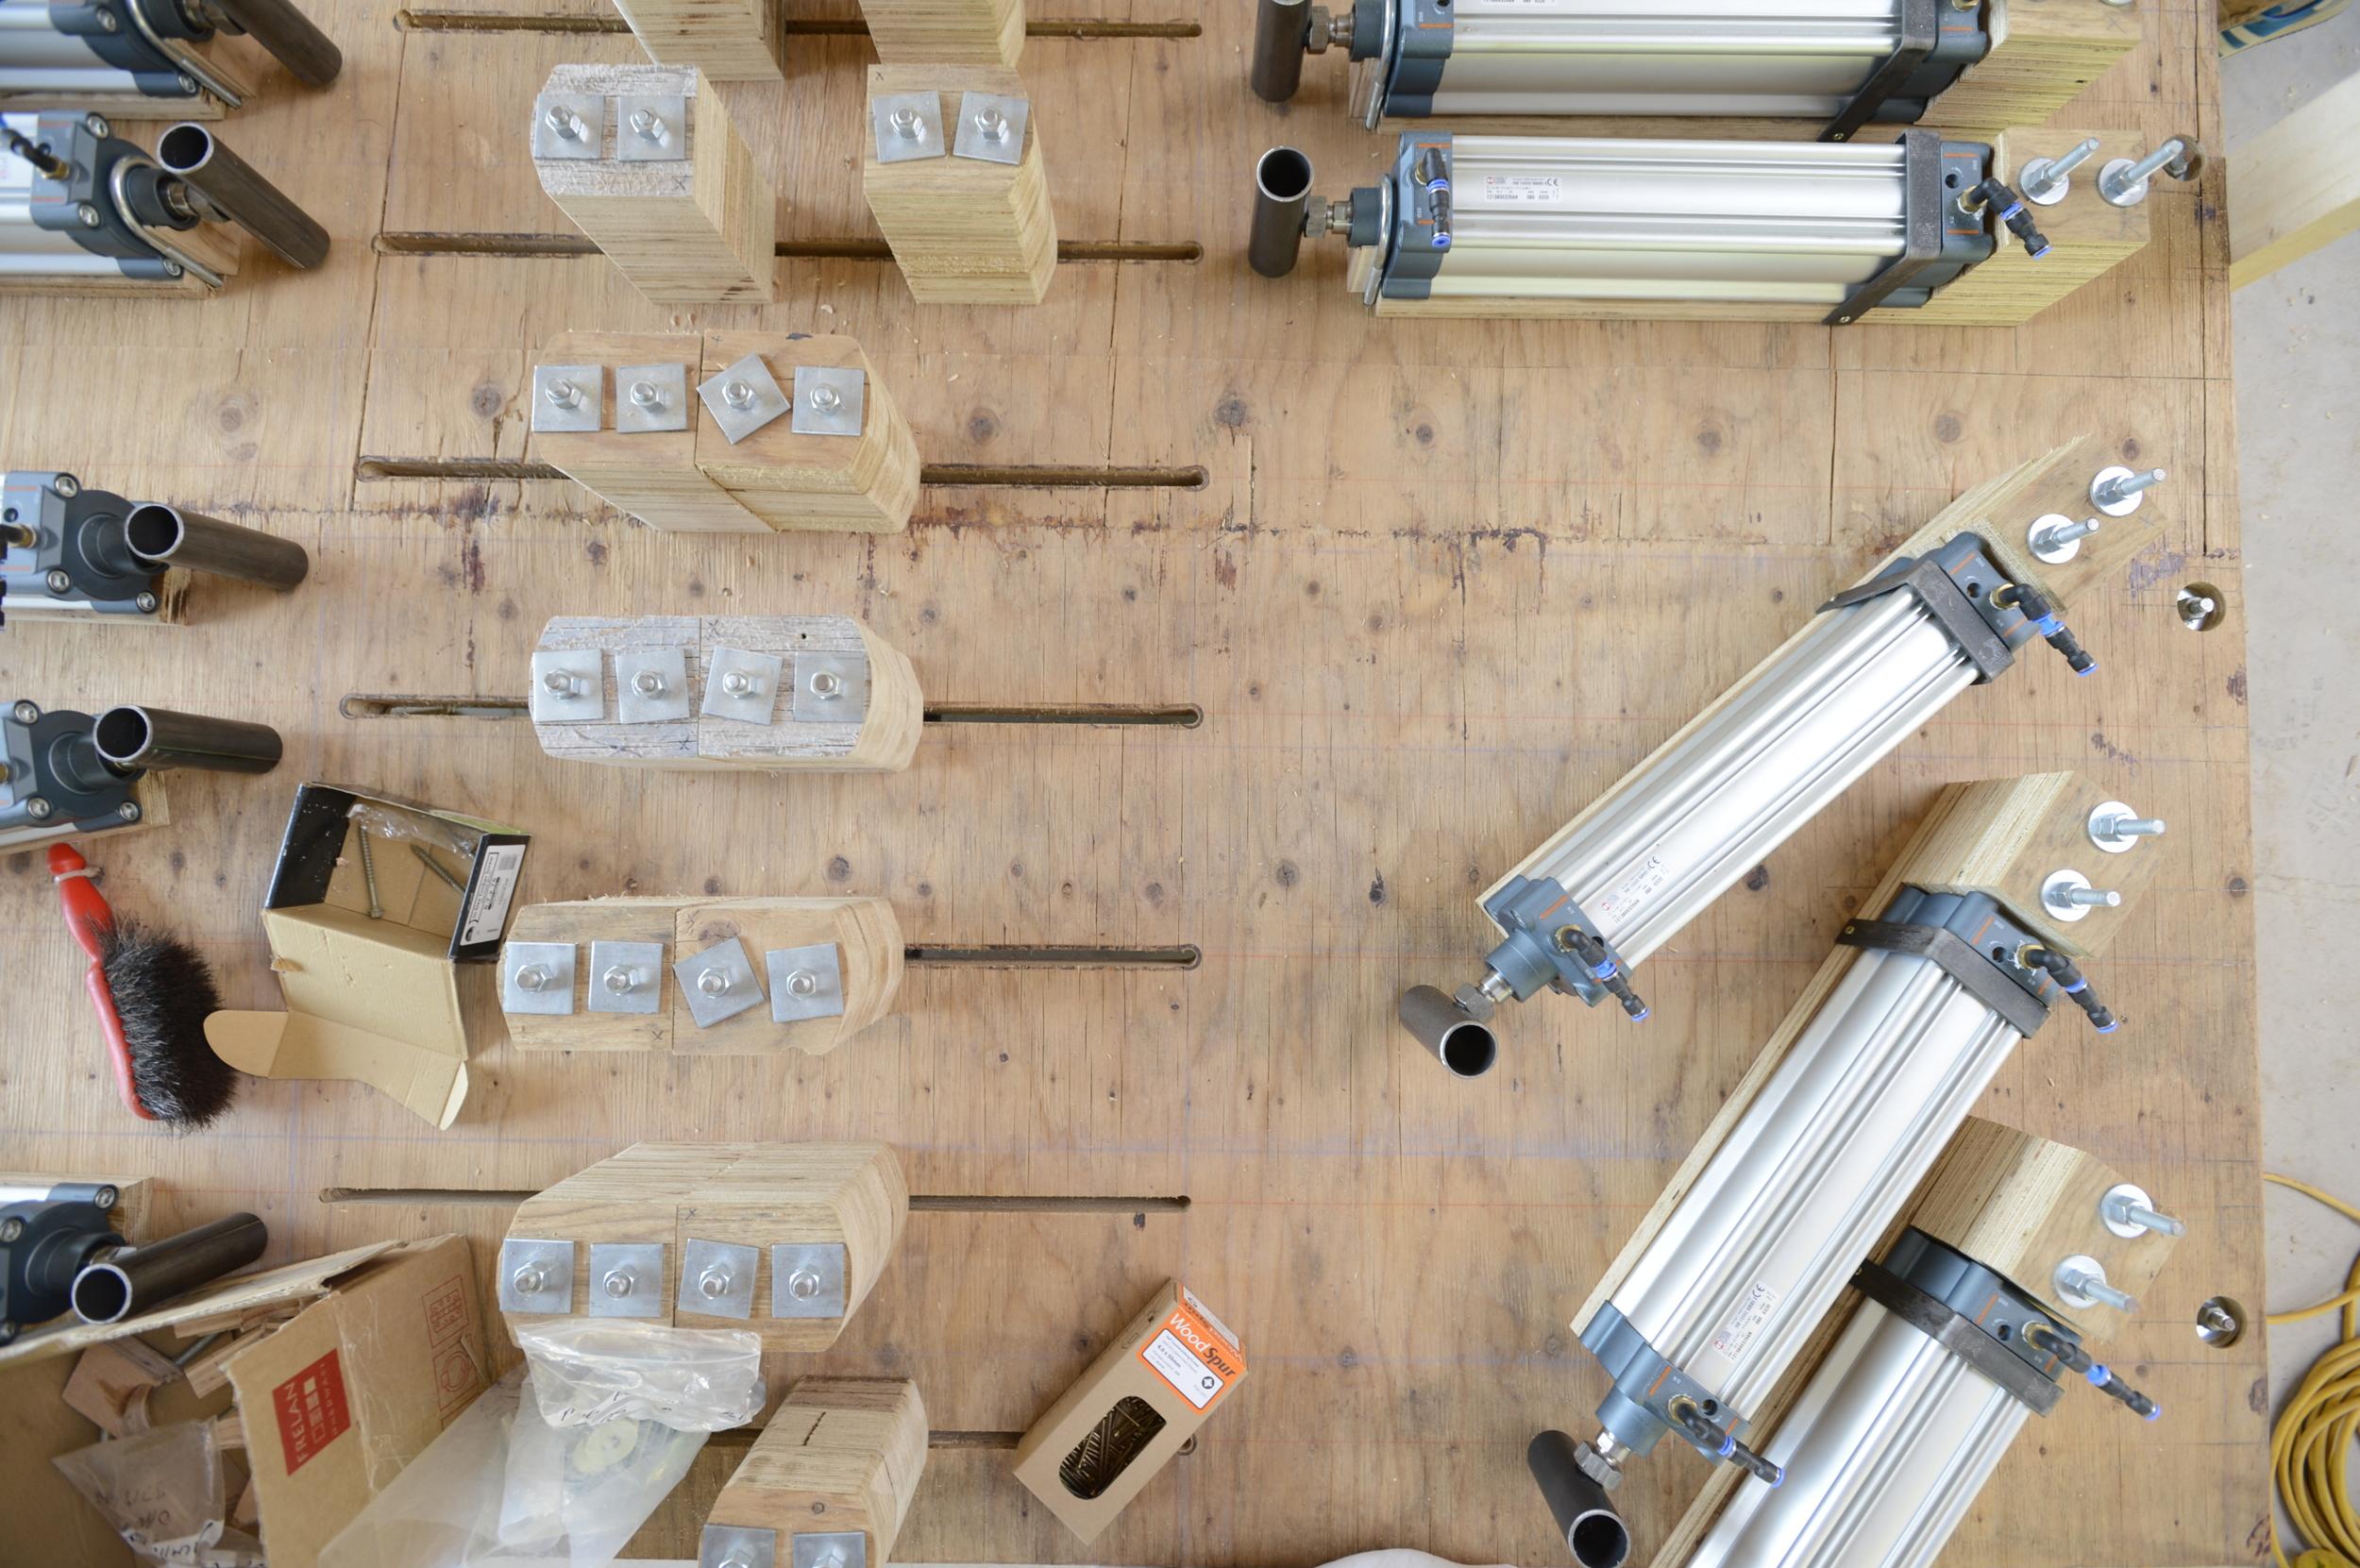 Hooke_Park_Design_and_Make_Timber_Seasoning_Shelter_jig_VB_2013_07_17_0199.JPG